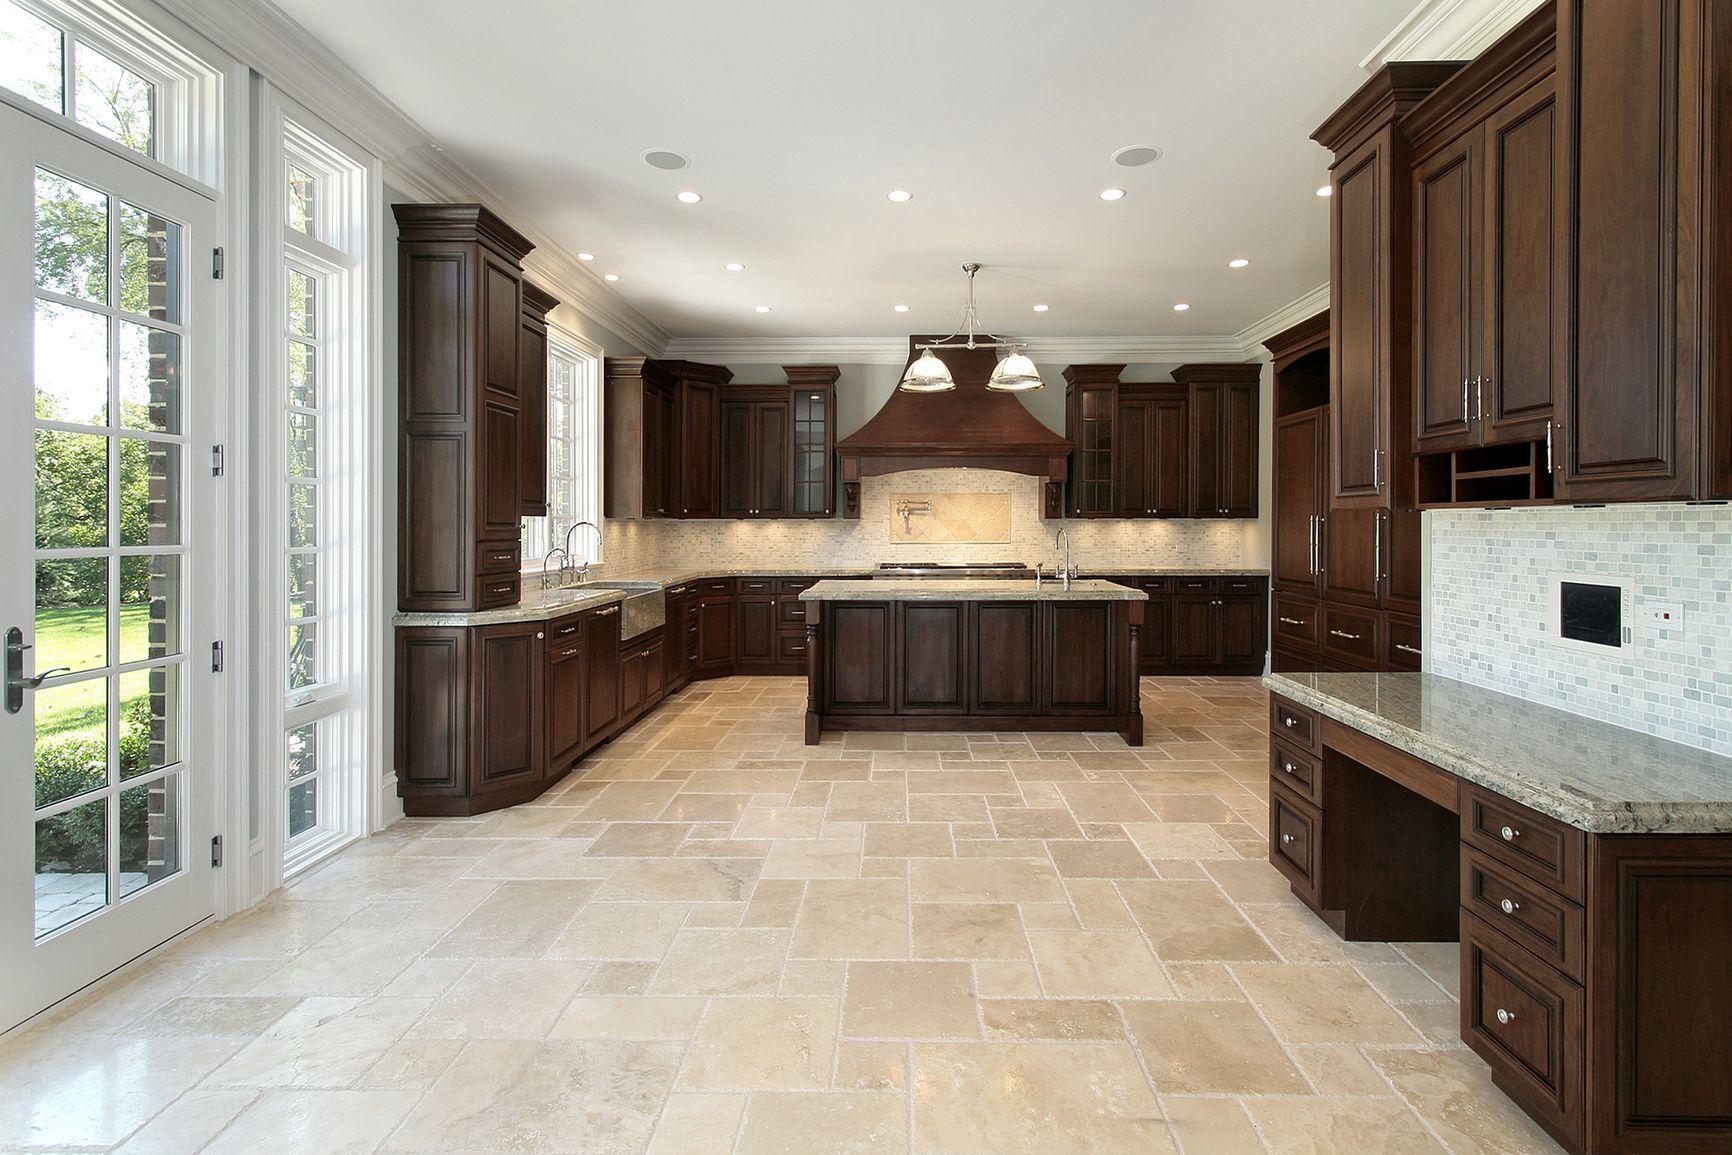 Contemporary Floor Tiles kitchen floor tile ideas. zamp.co